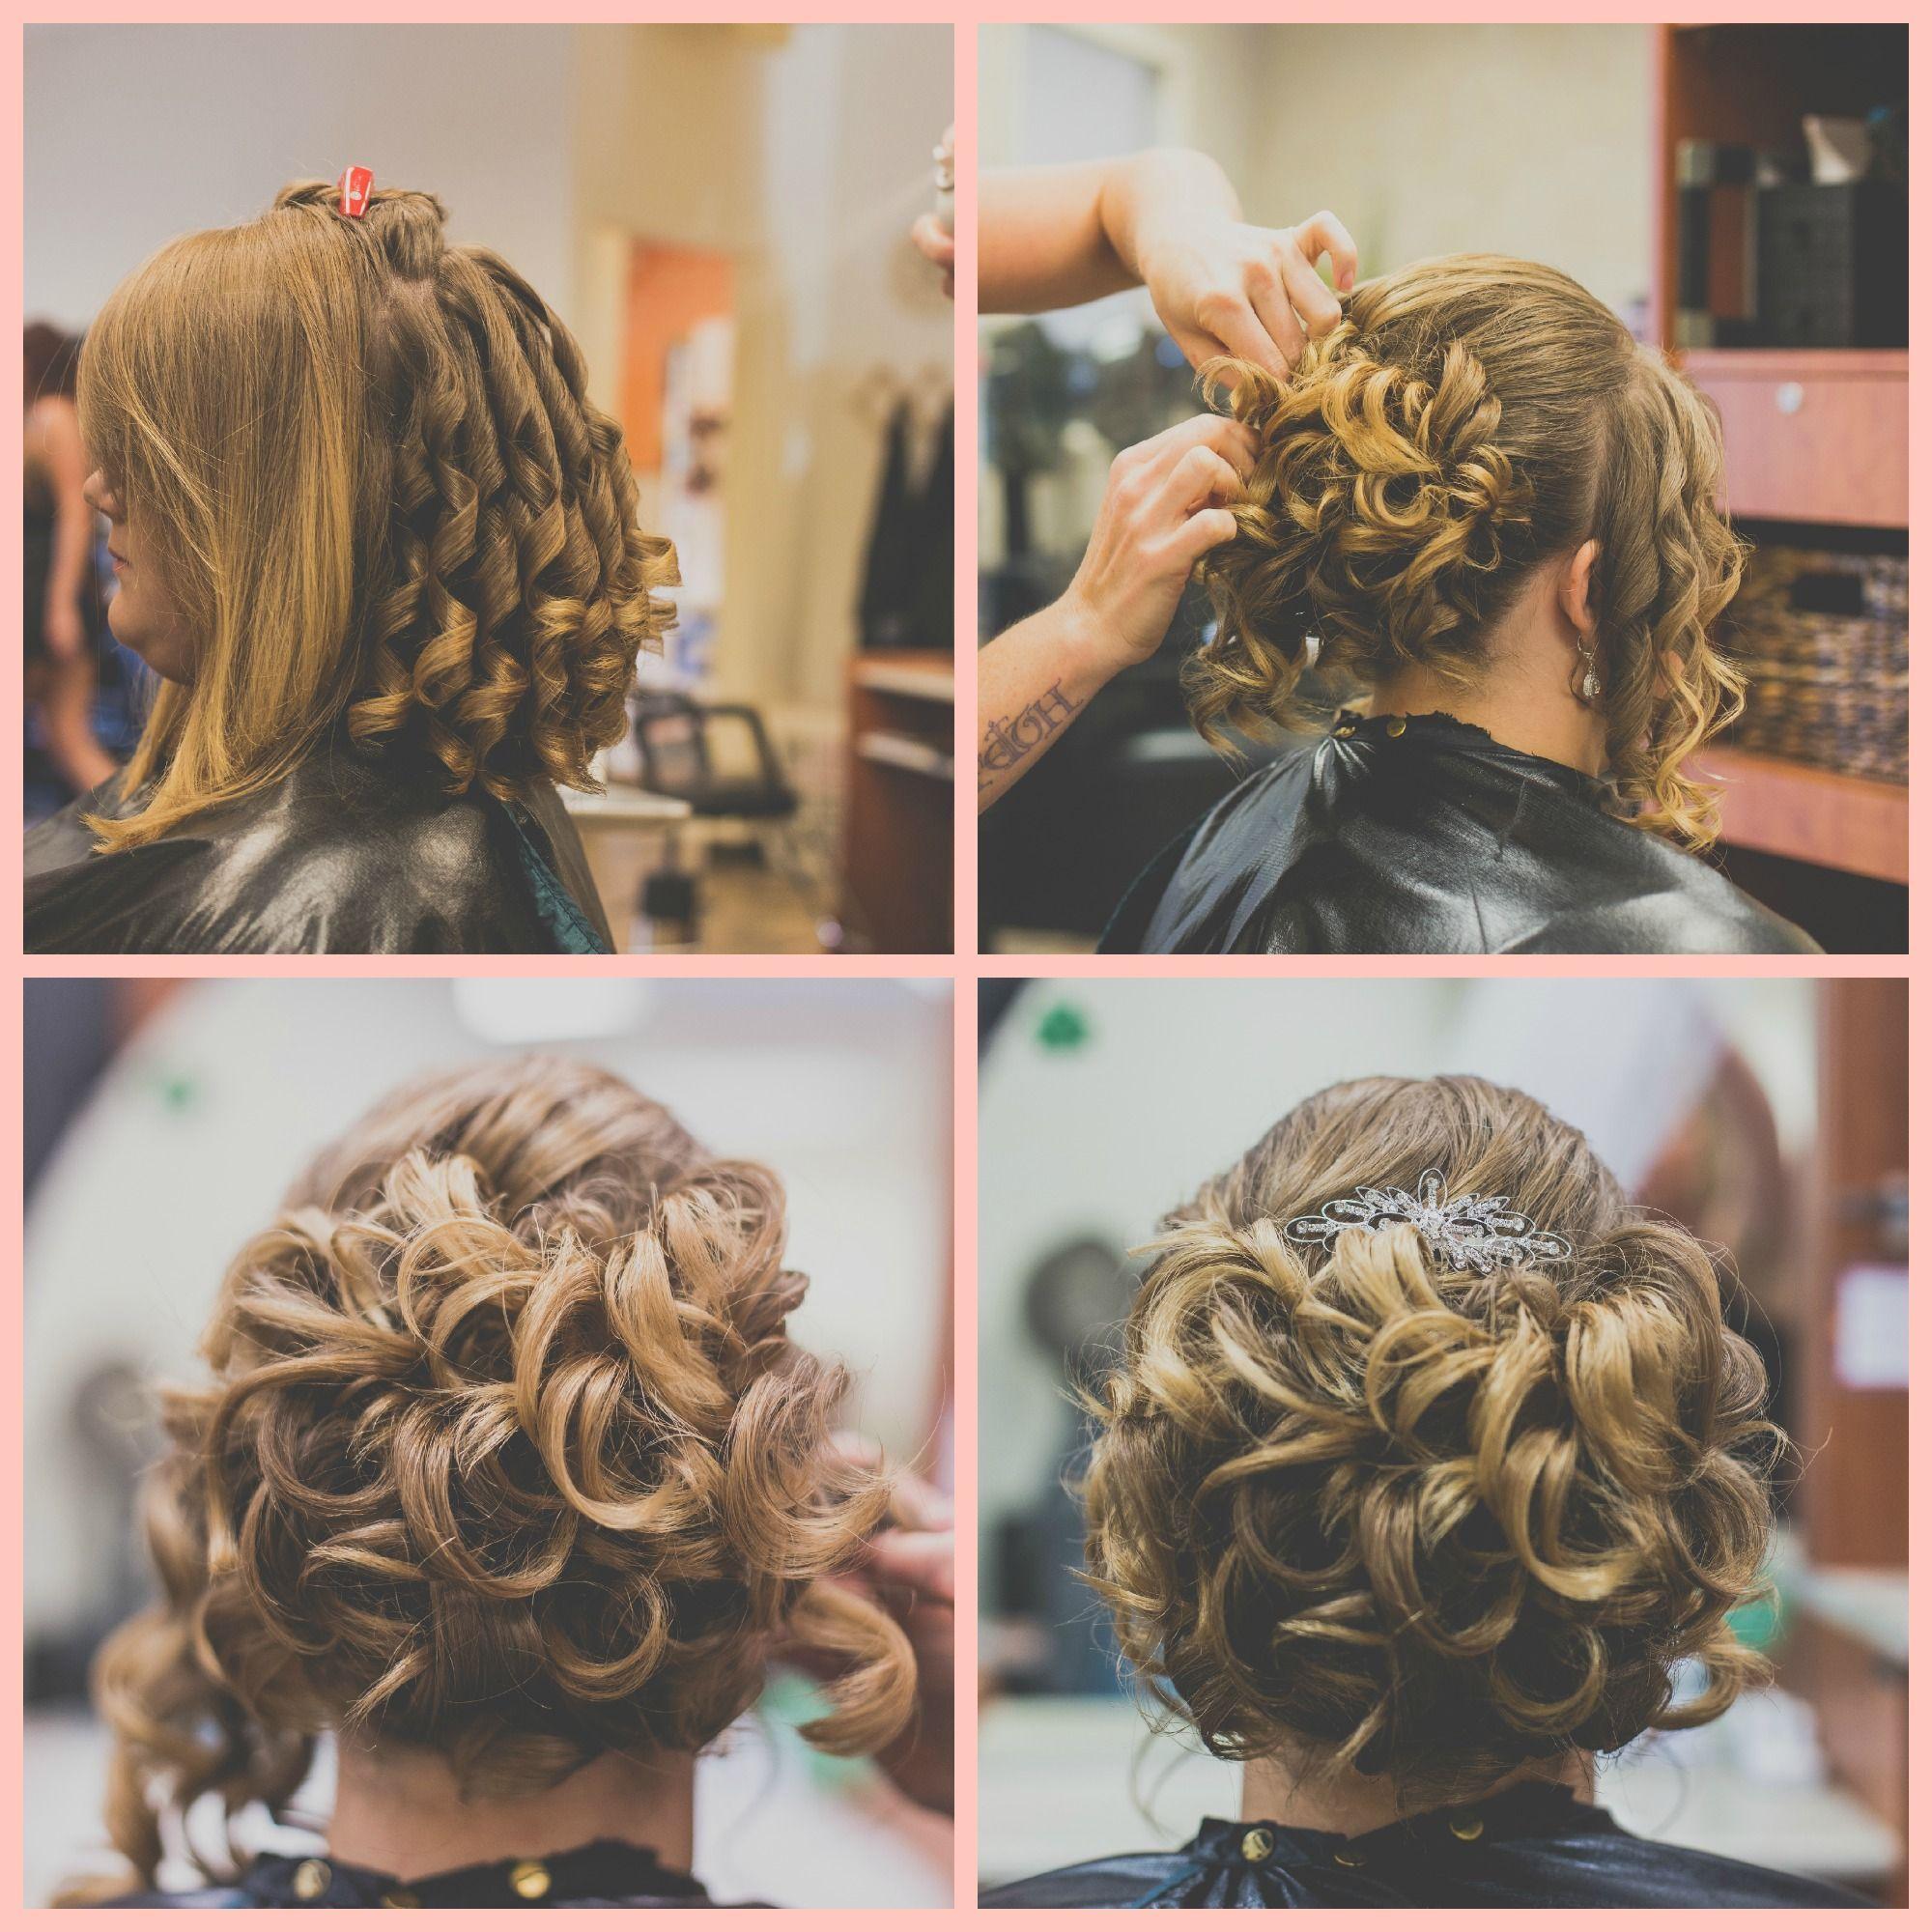 Wedding Hair Up Do For Short Shoulder Length Hair Weddinghairshort Hair Styles Shoulder Length Hair Short Hair Updo